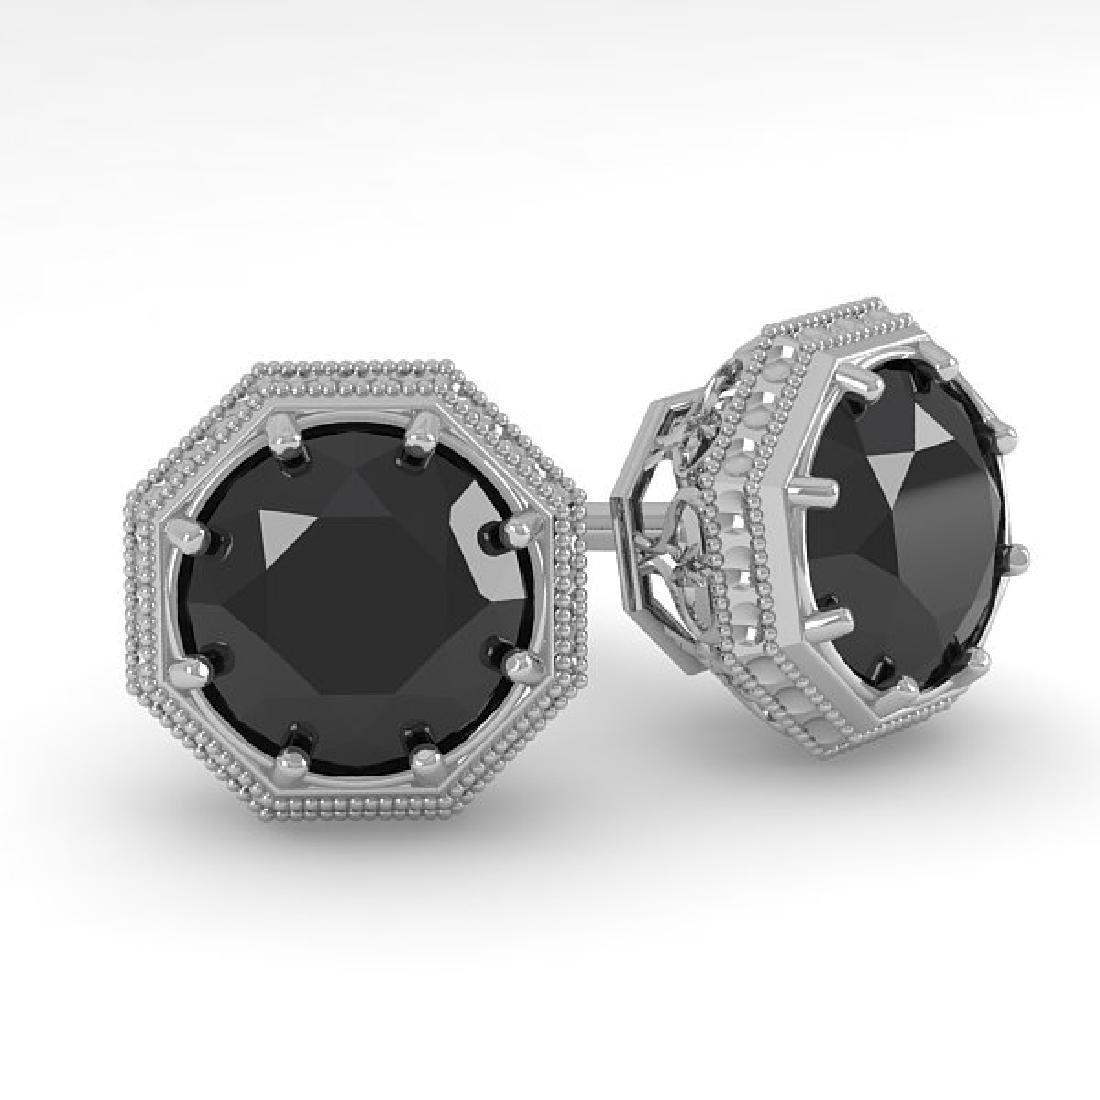 1.0 CTW Black Diamond Stud Solitaire Earrings 14K White